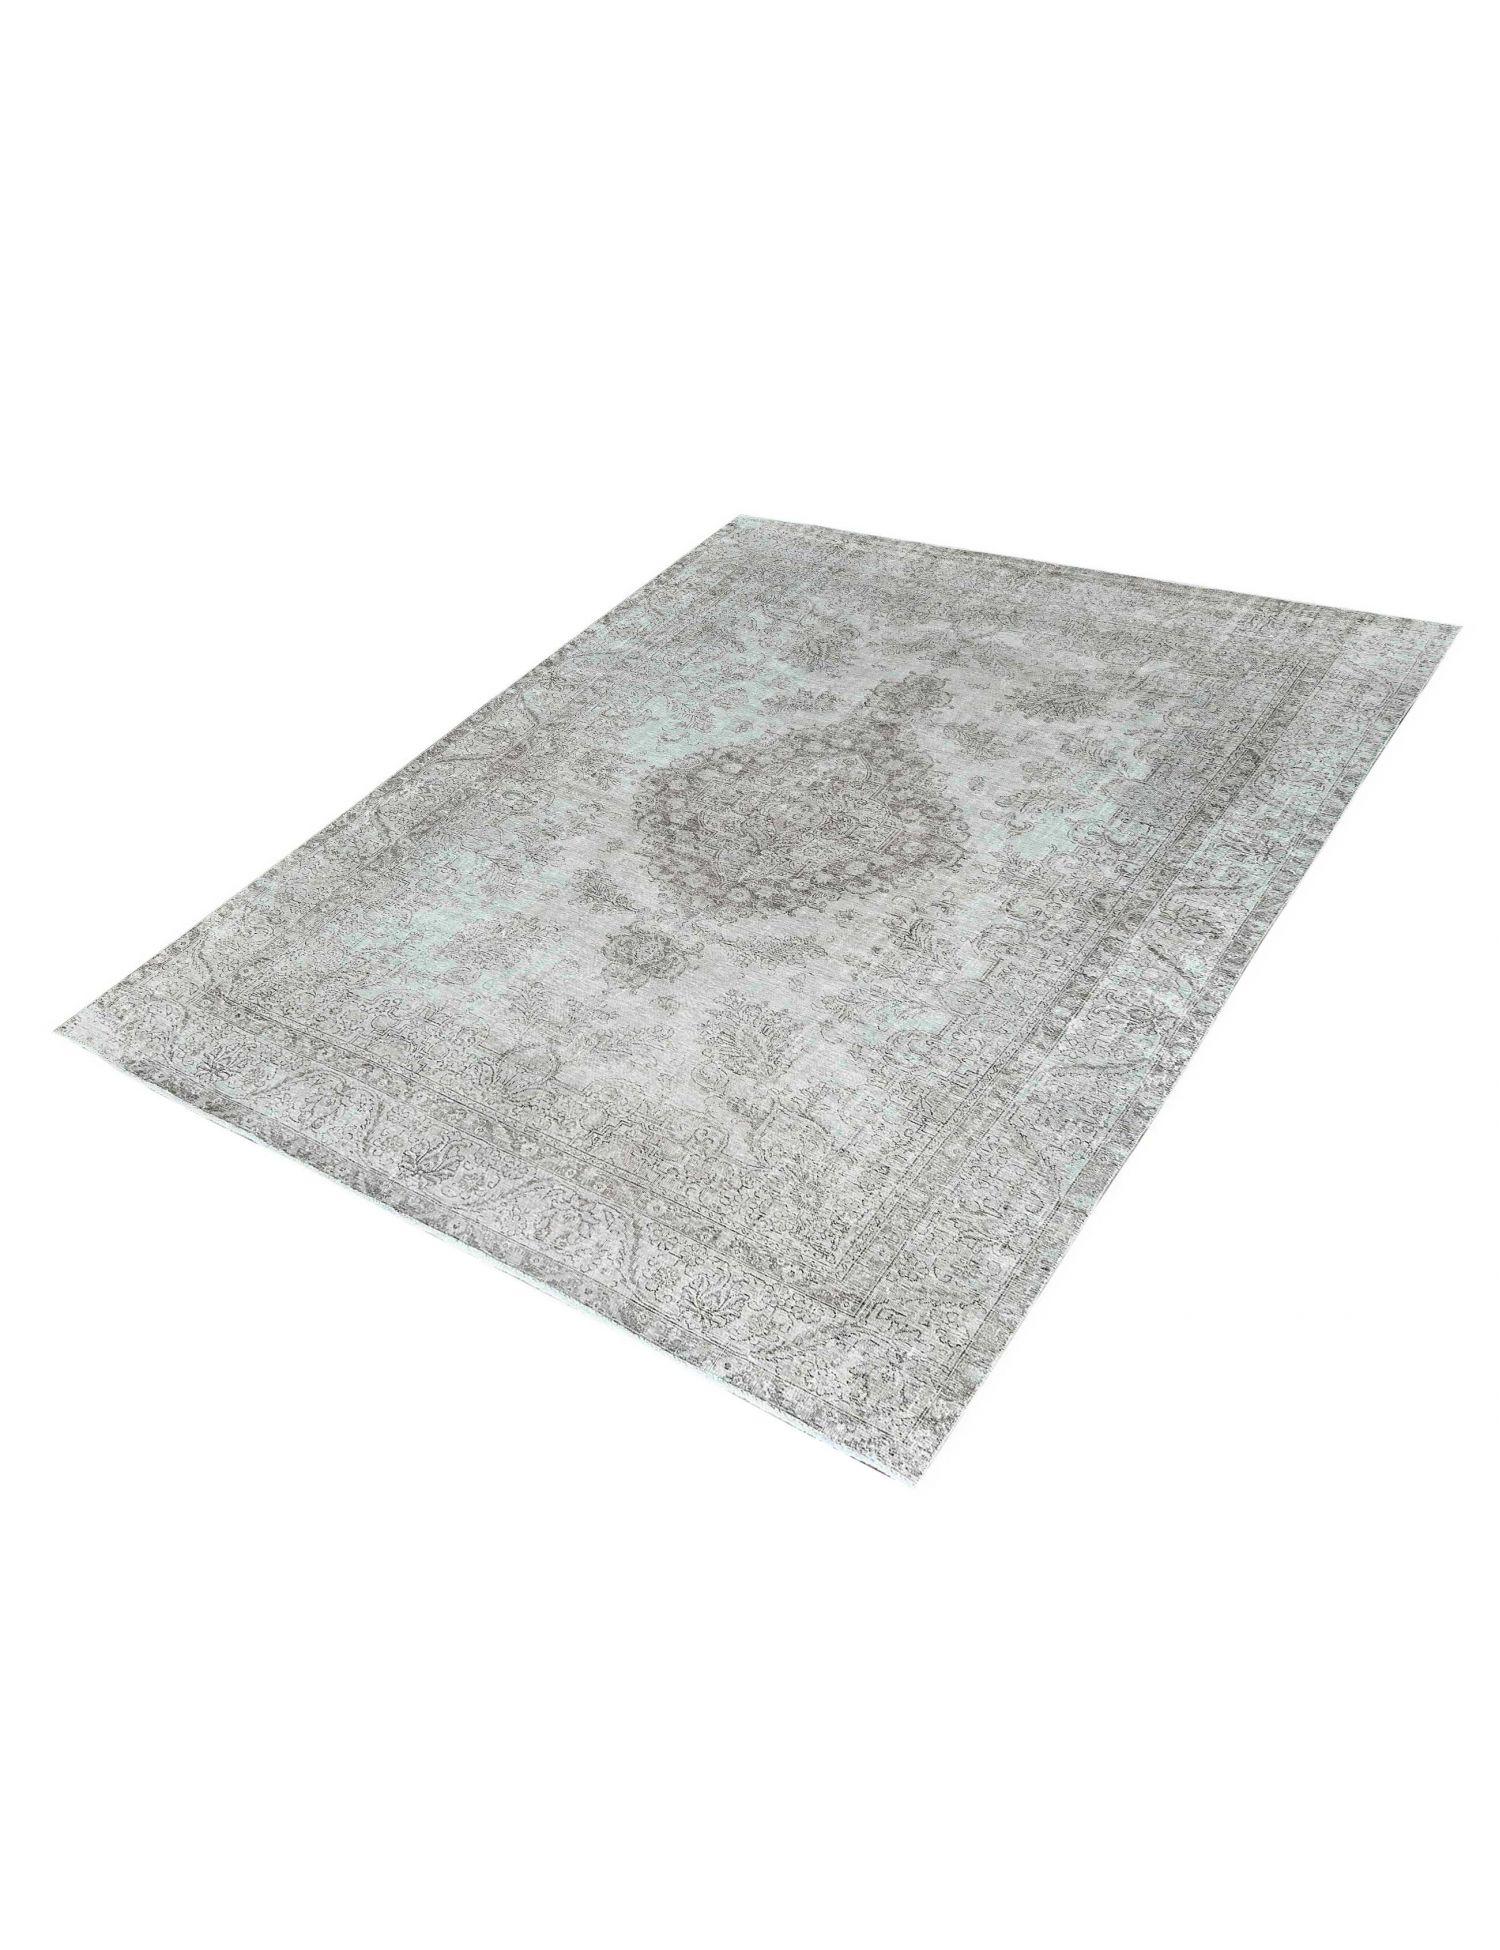 Vintage Perserteppich  grau <br/>401 x 296 cm